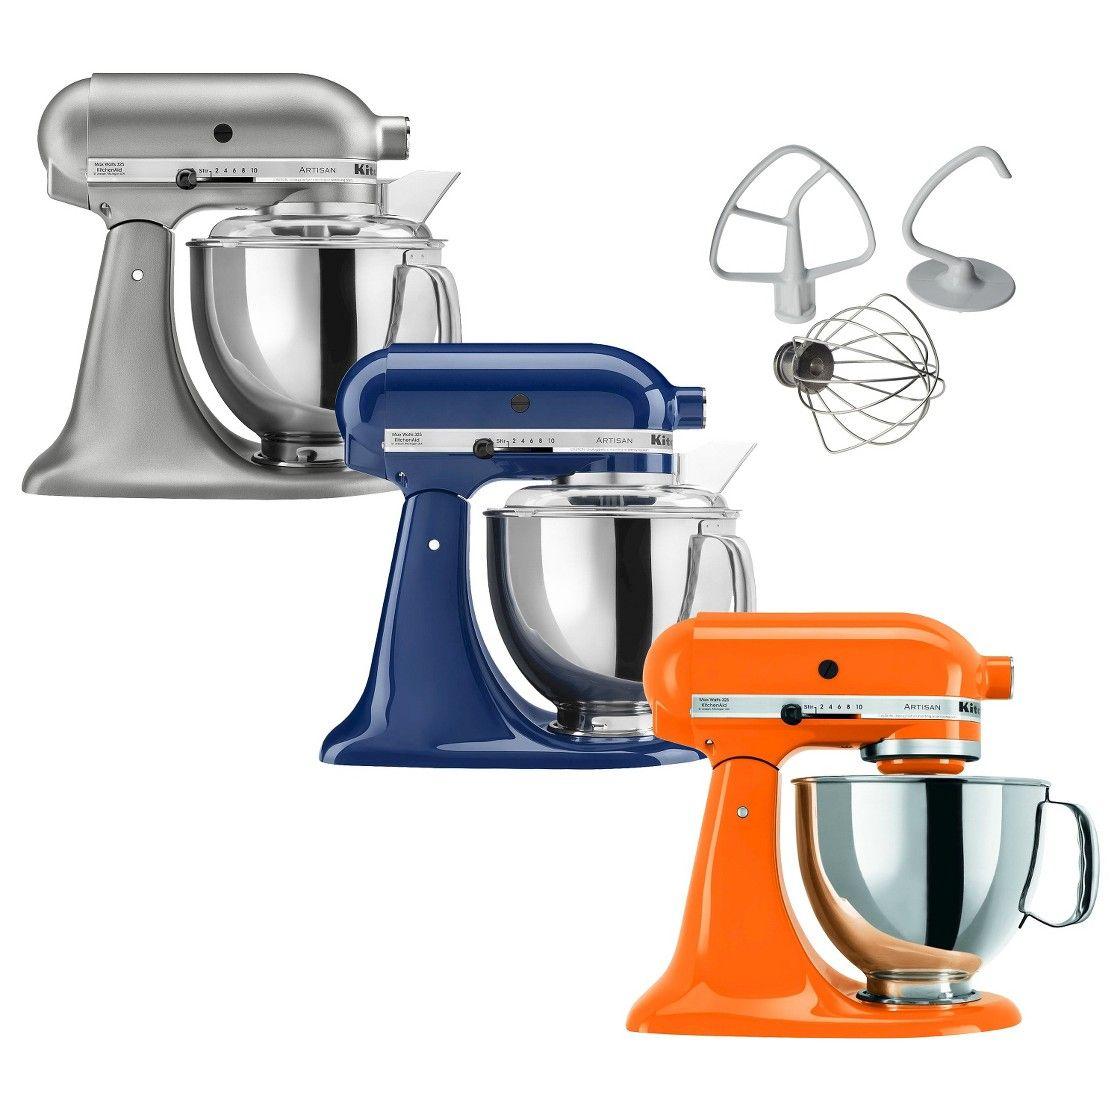 Kitchenaid artisan 5 qt stand mixer kitchenaid artisan